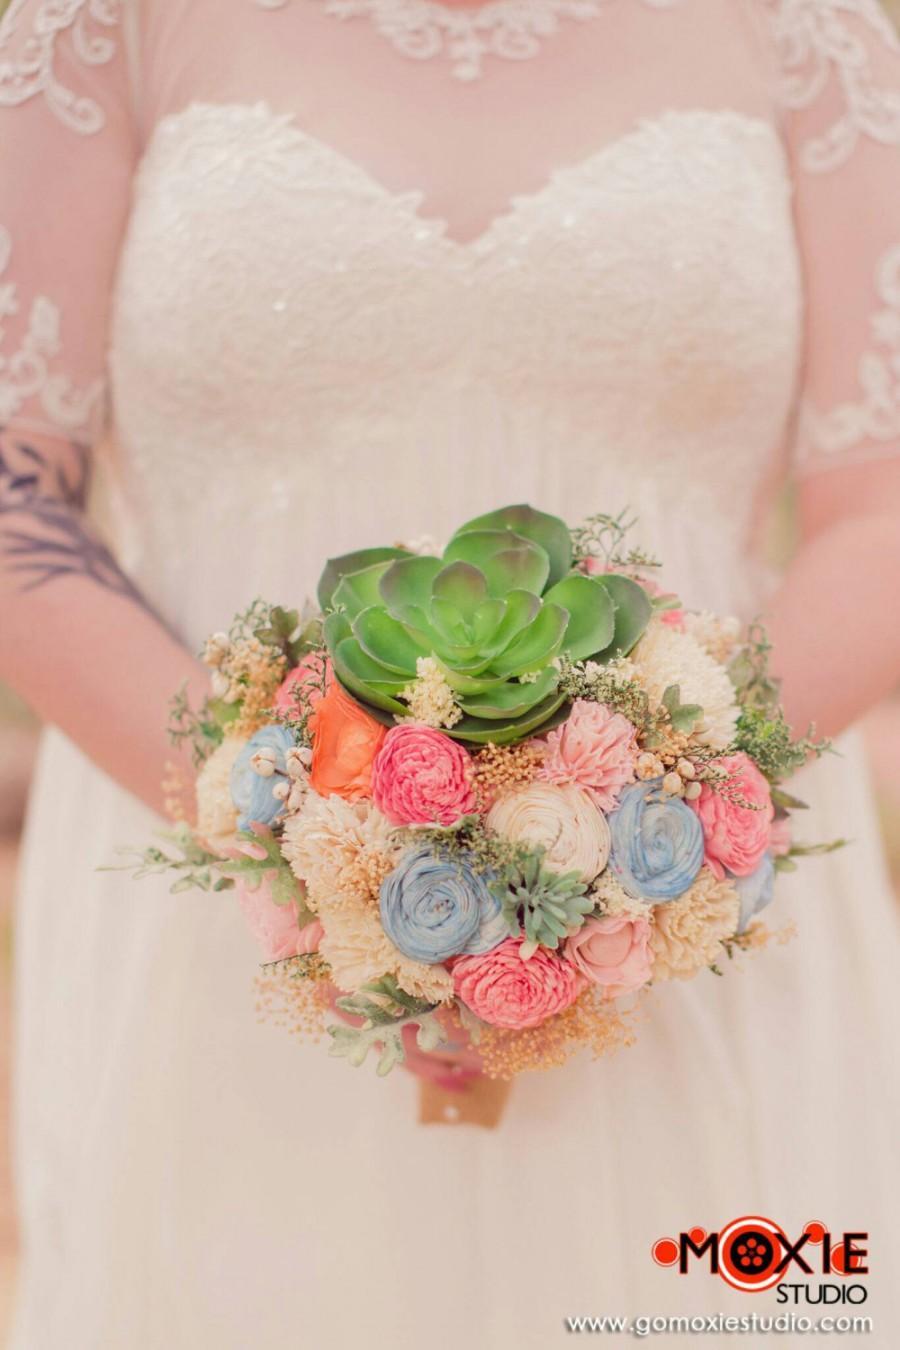 Mariage - Alternative Bridal Bouquet - Succulents, Dusty Miller, Sola Flowers, Keepsake Bouquet, Sola Bouquet, Rustic Wedding